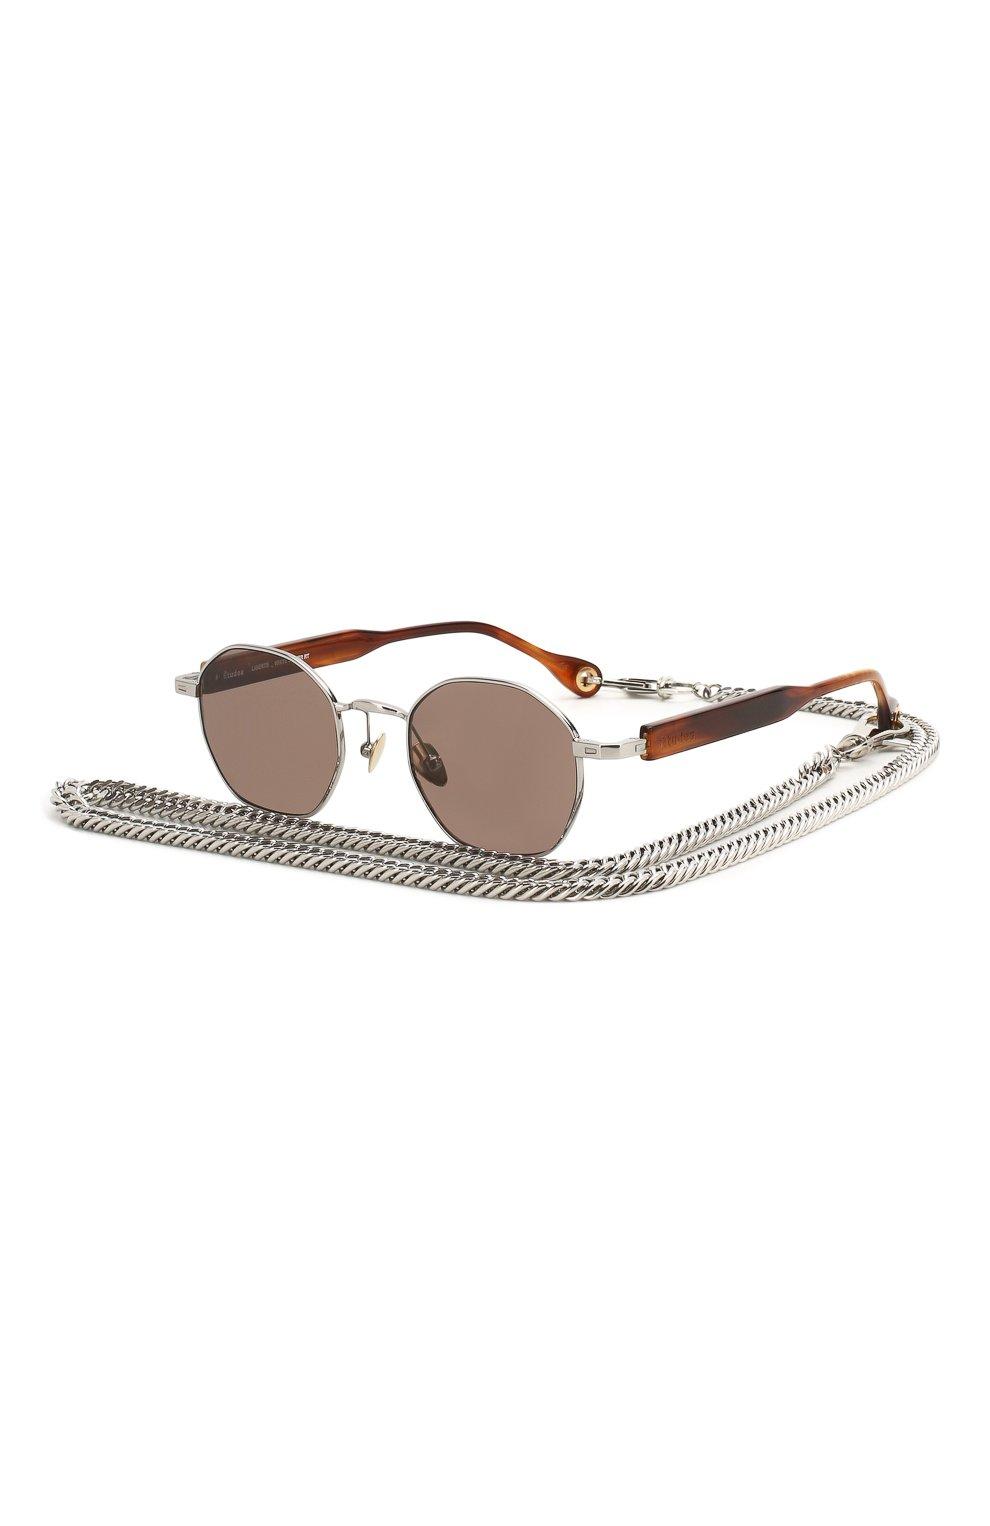 Женские солнцезащитные очки ÉTUDES серебряного цвета, арт. LIBERTE WHITE SILVER RT WITH CHAIN | Фото 1